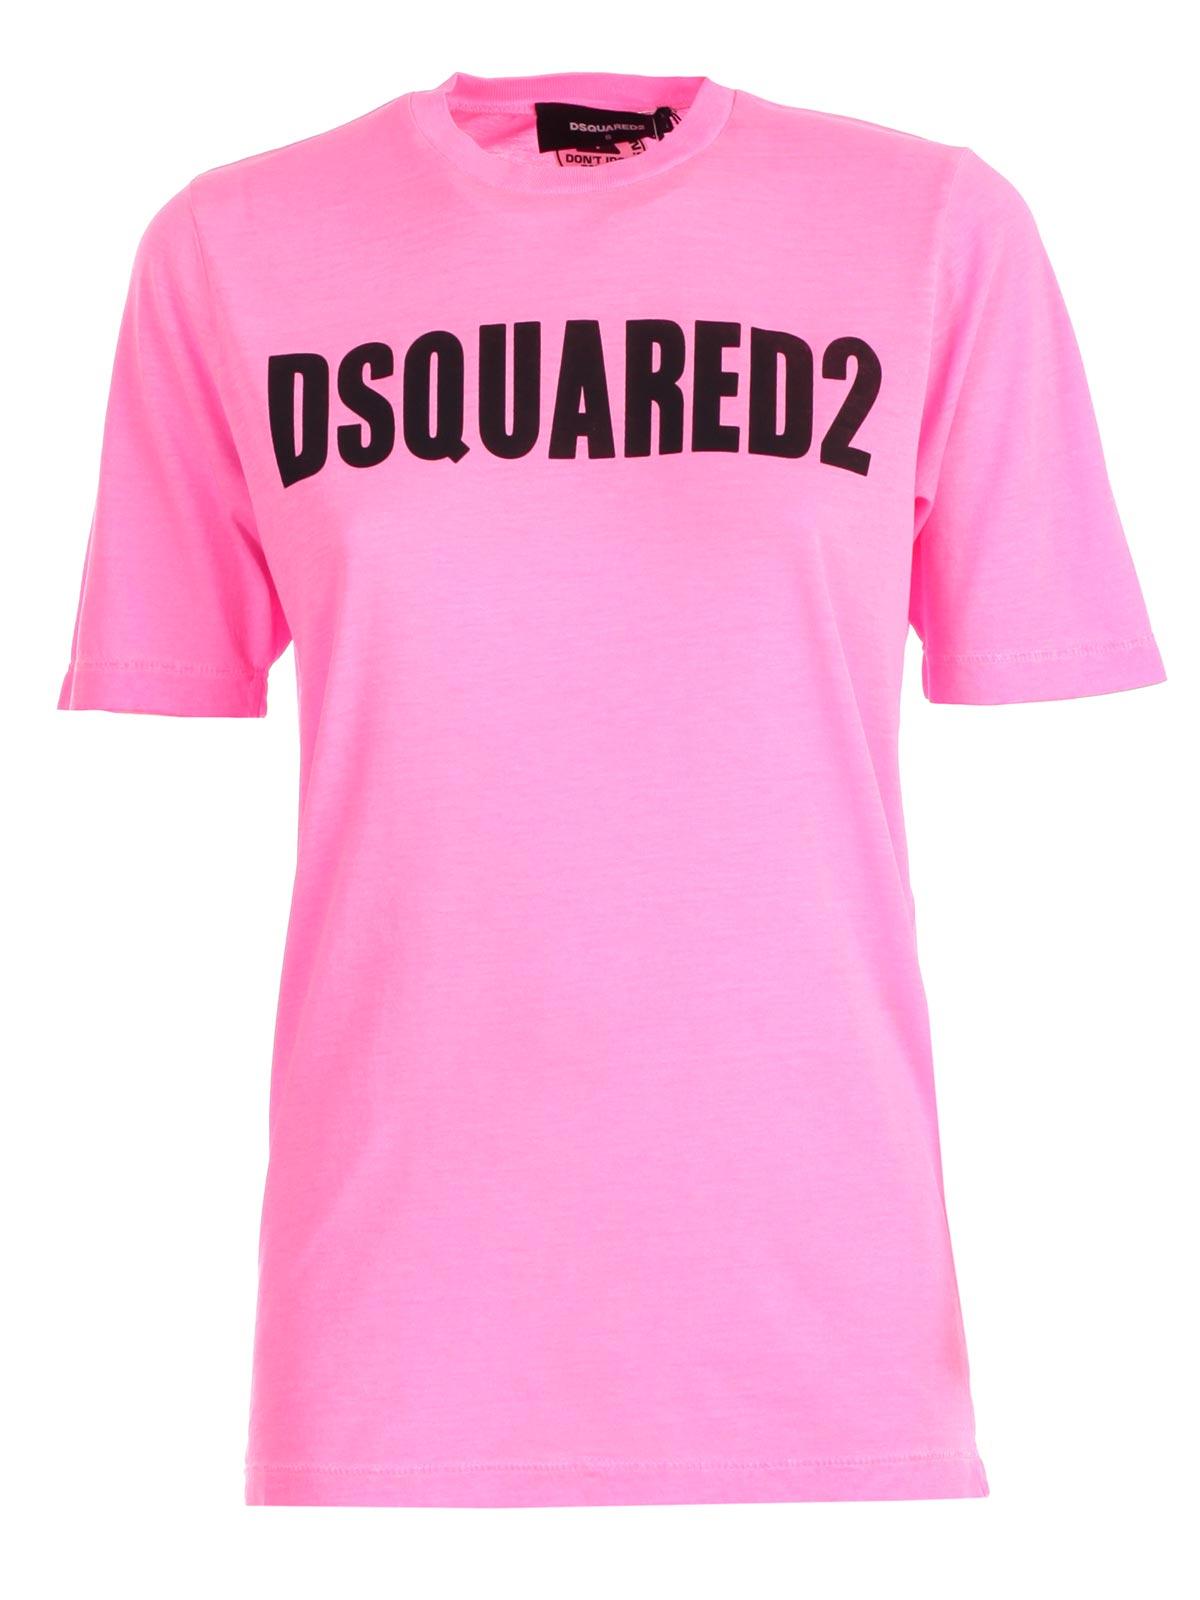 1f499f53 Dsquared2 T- Shirt S72GD0147.S21600 - 911 PINK.Bernardelli Store ...